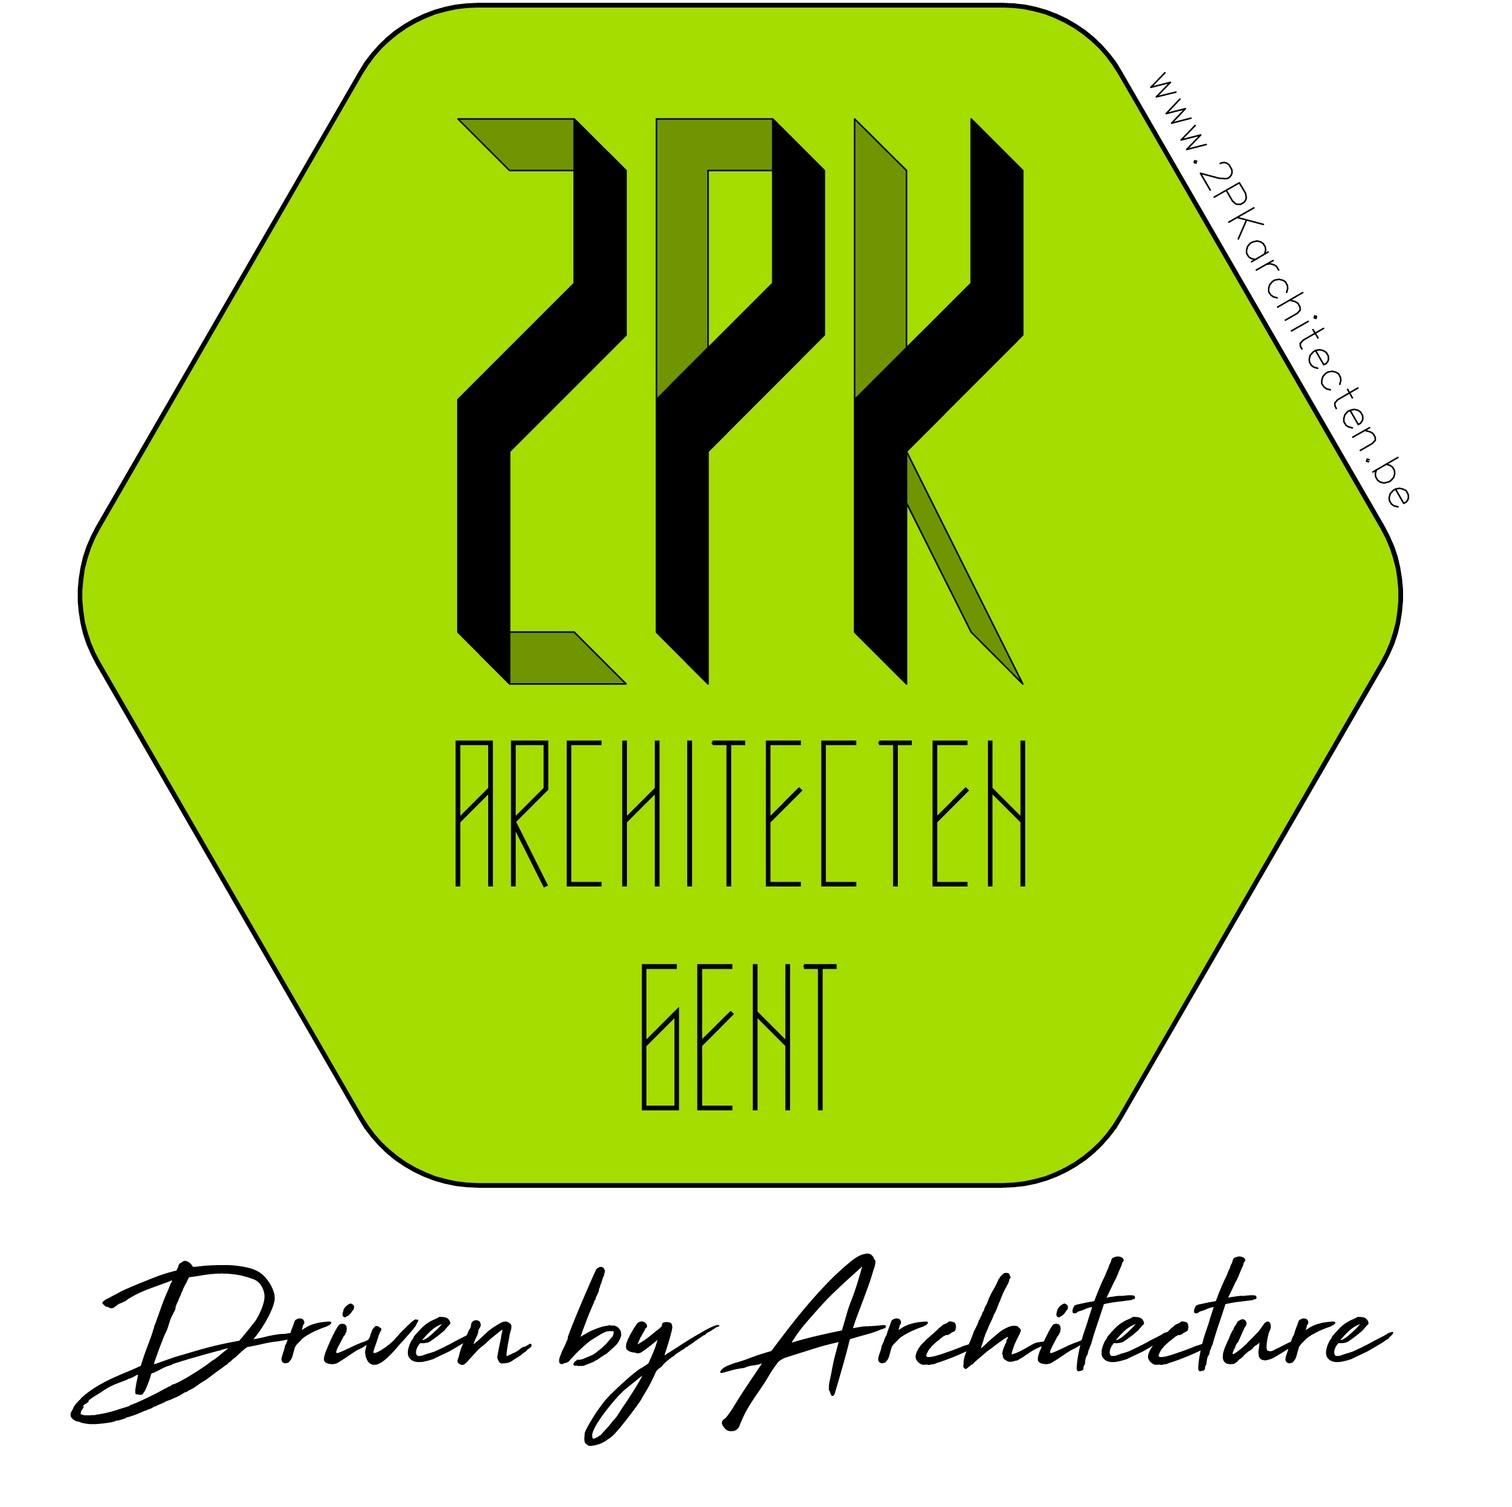 2PK architecten logo